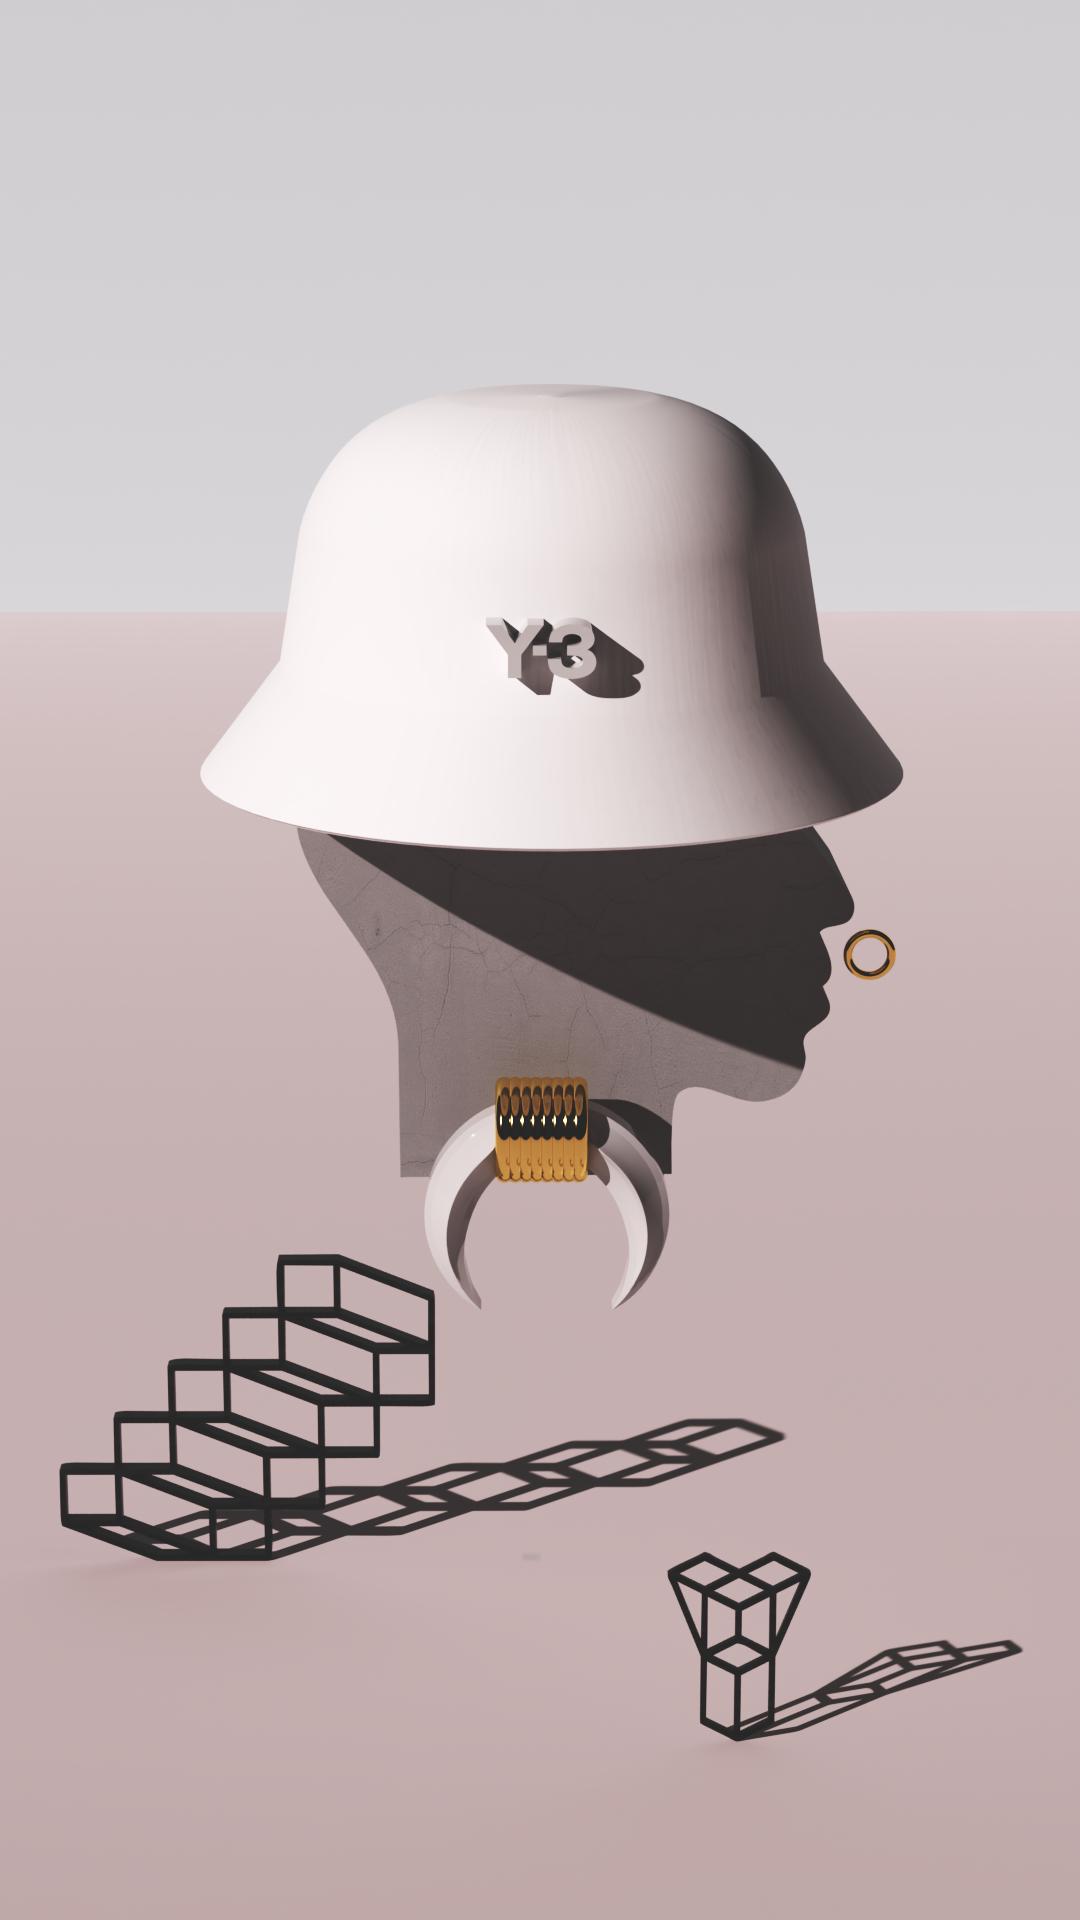 Art direction + design | YDK